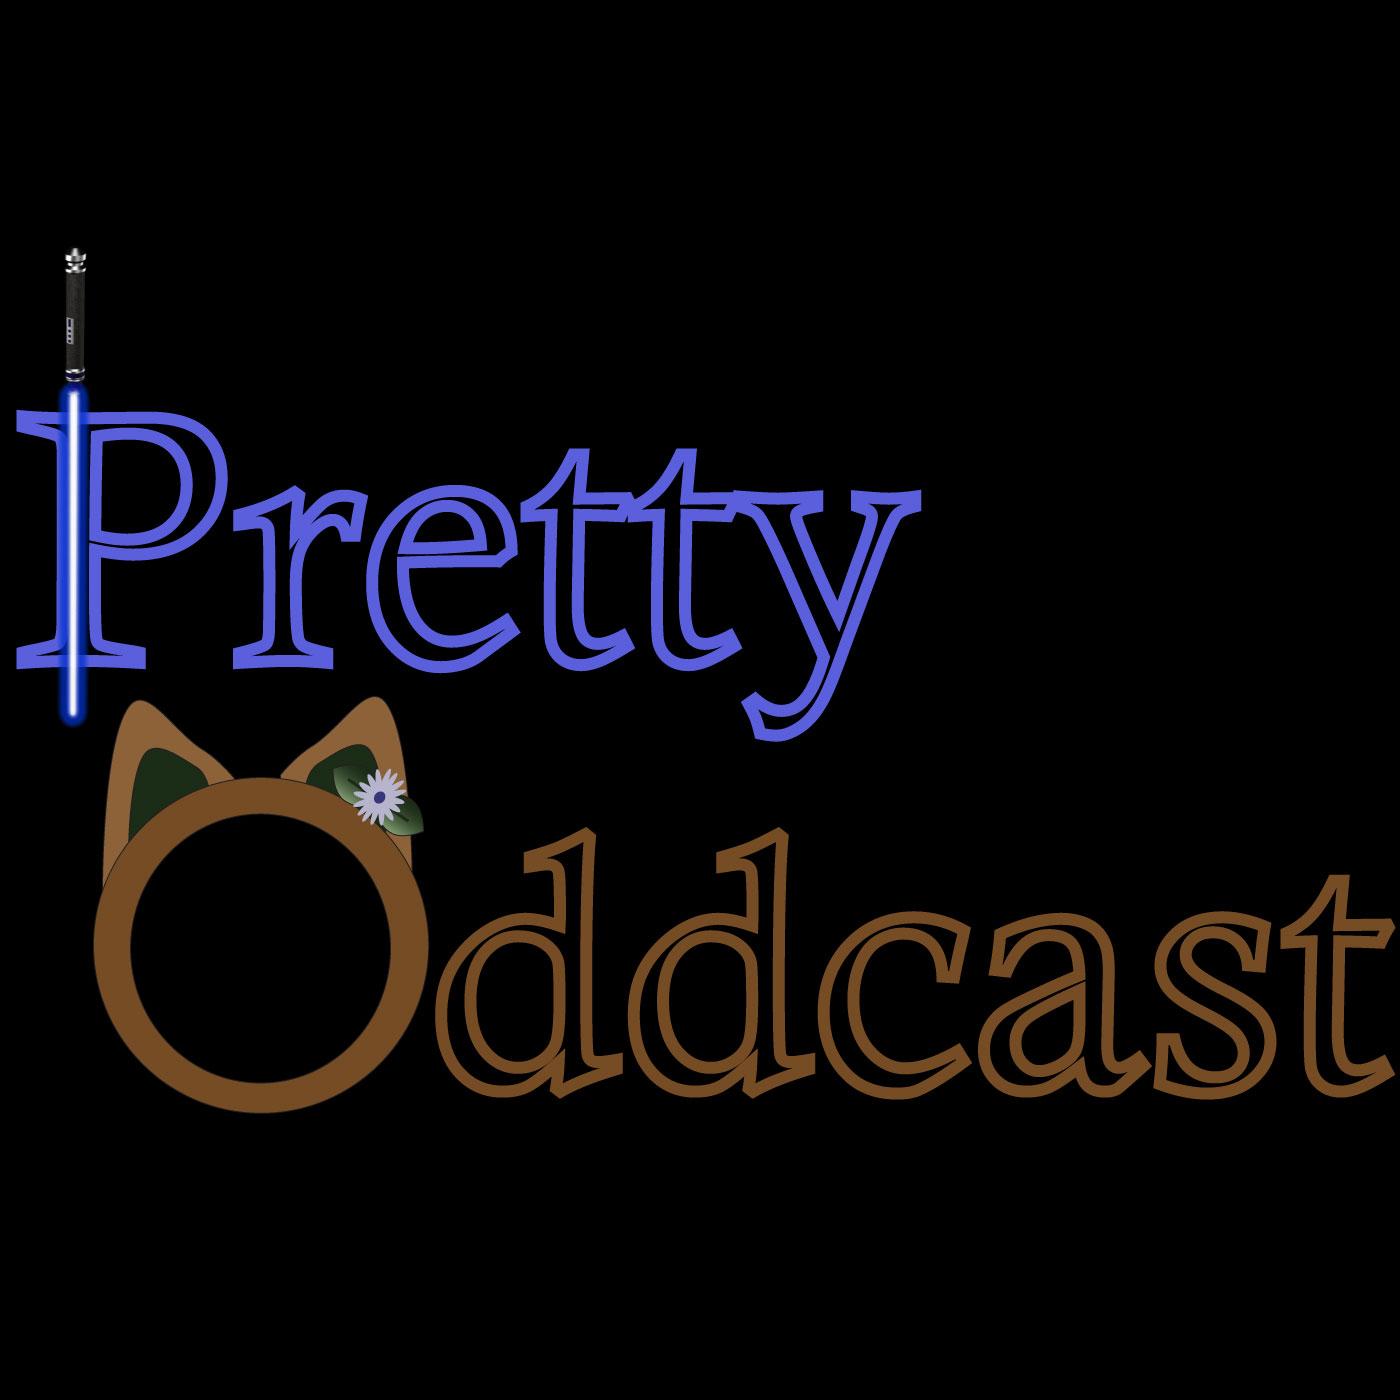 Pretty Oddcast by prettyoddcast@gmail com (prettyoddcast@gmail